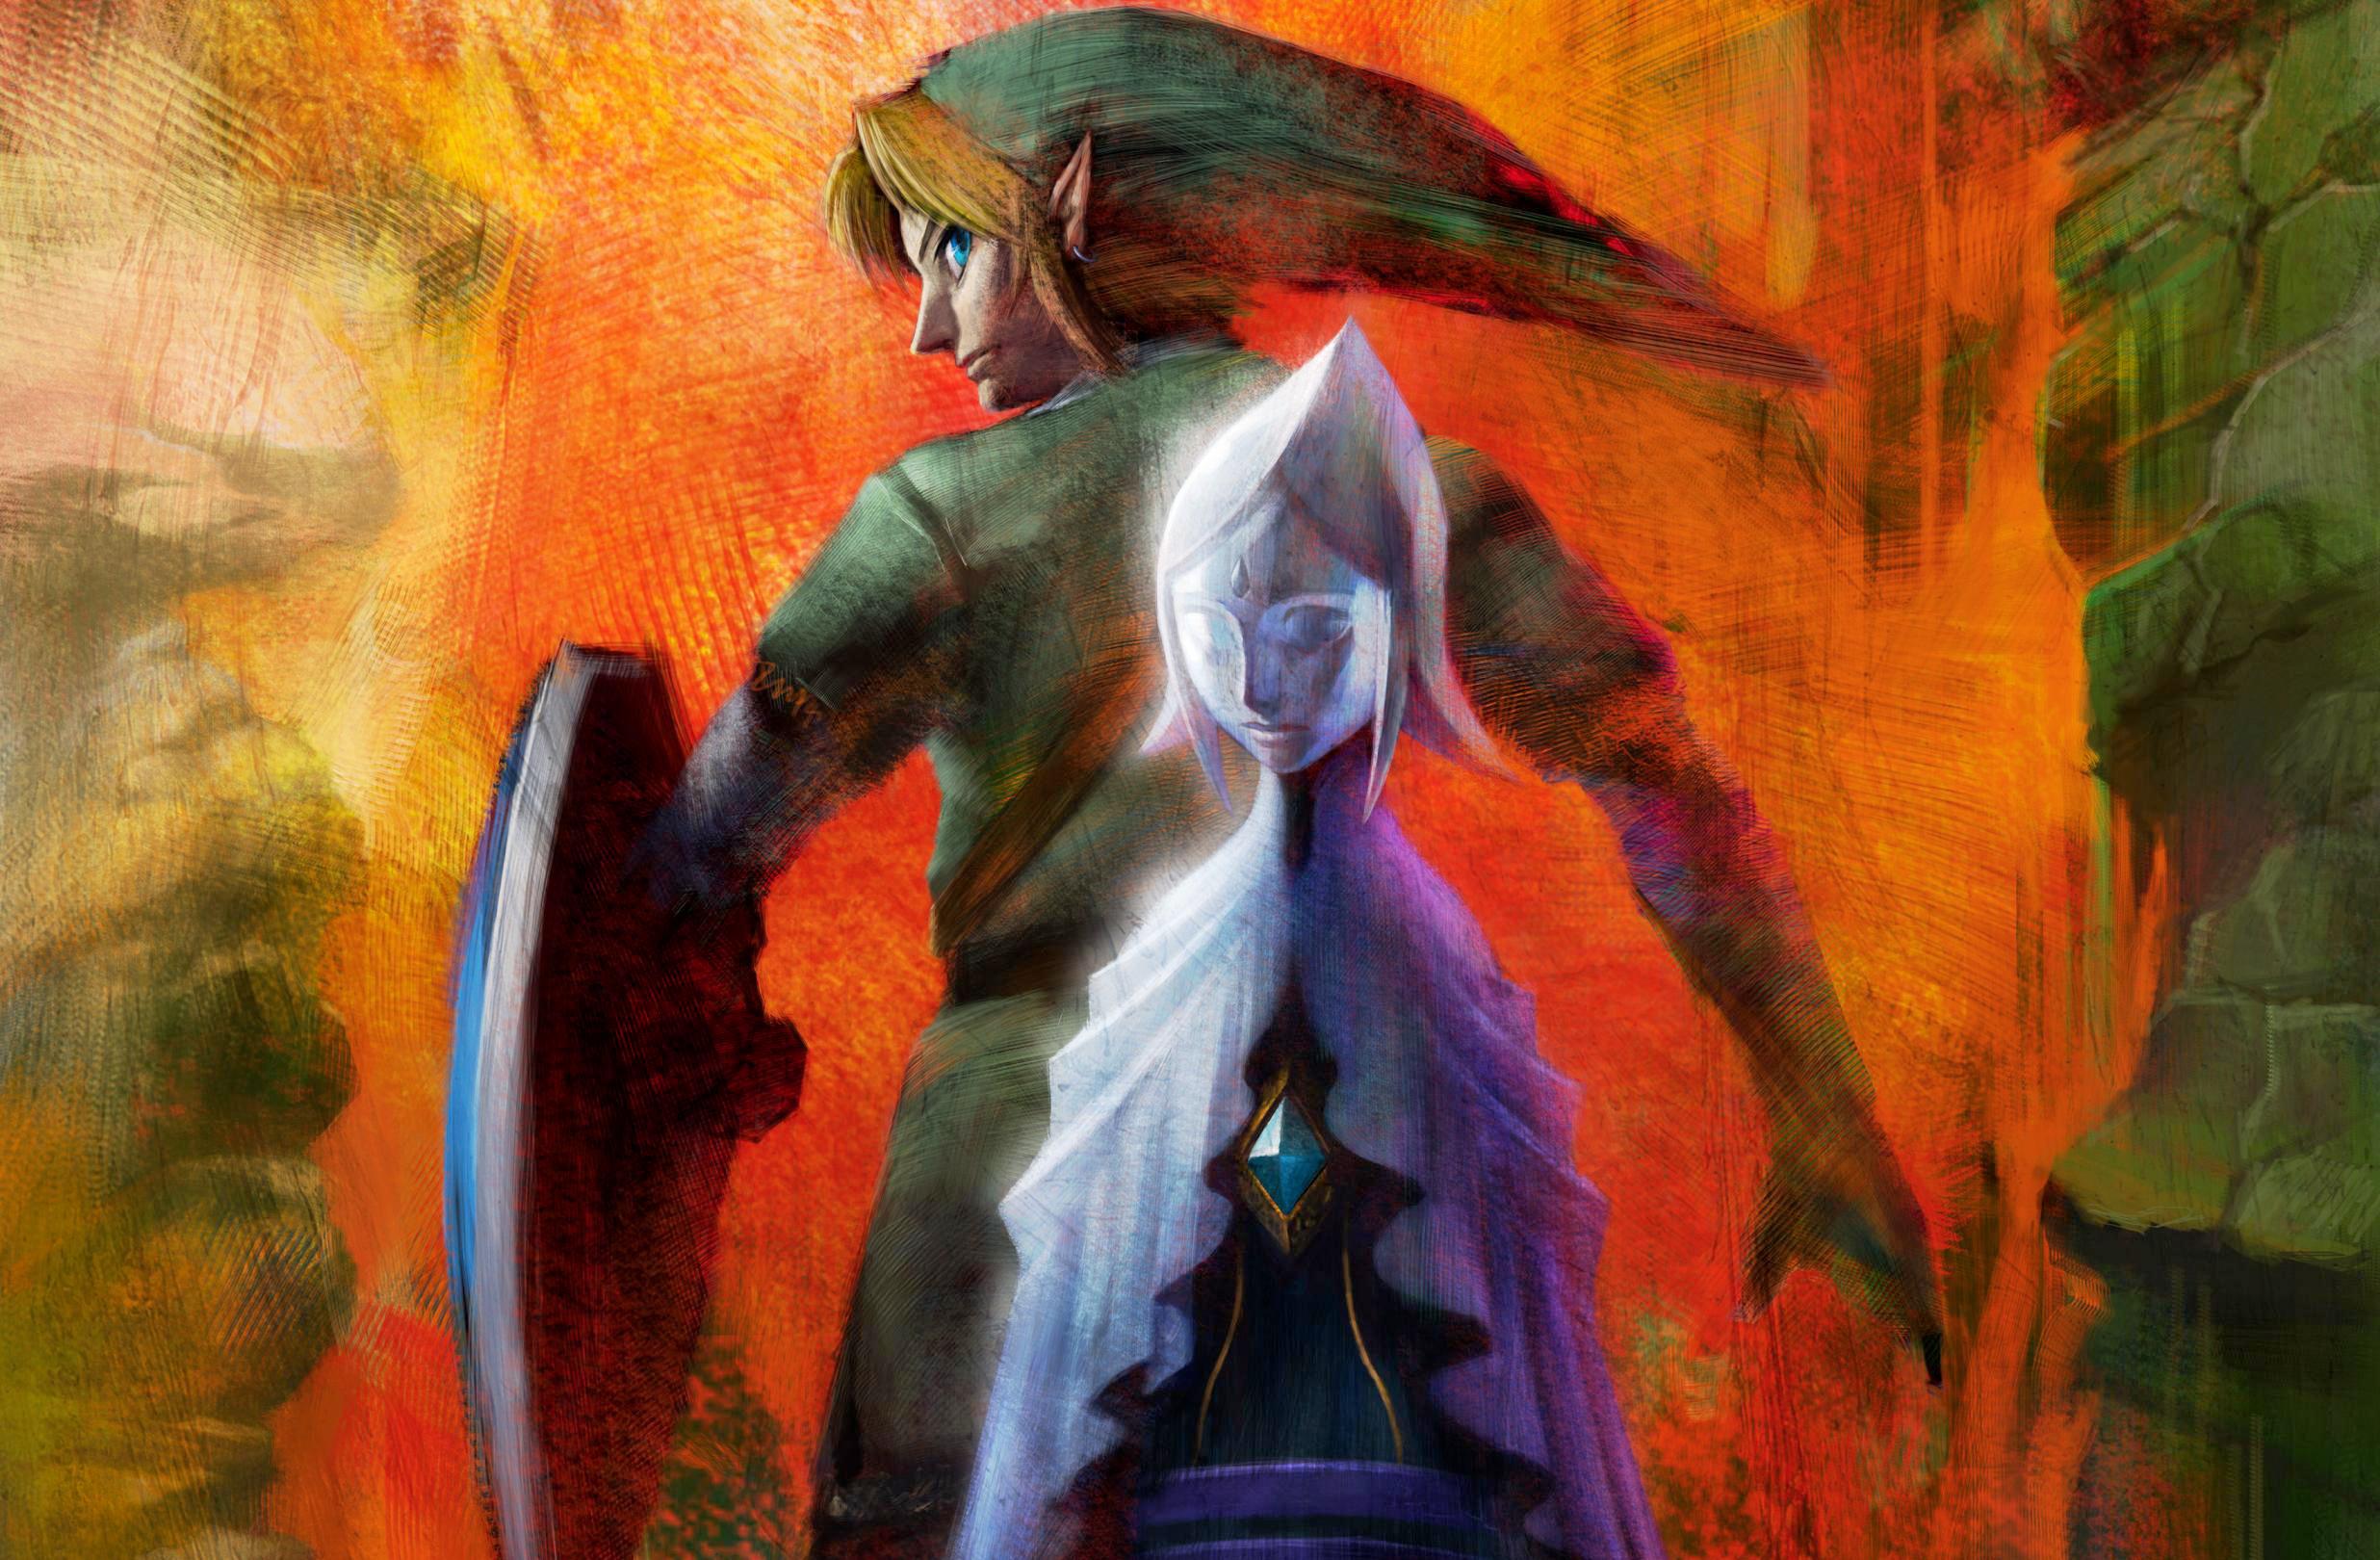 Link And Ganon Battle In New Legend Of Zelda Fan Film Vg247